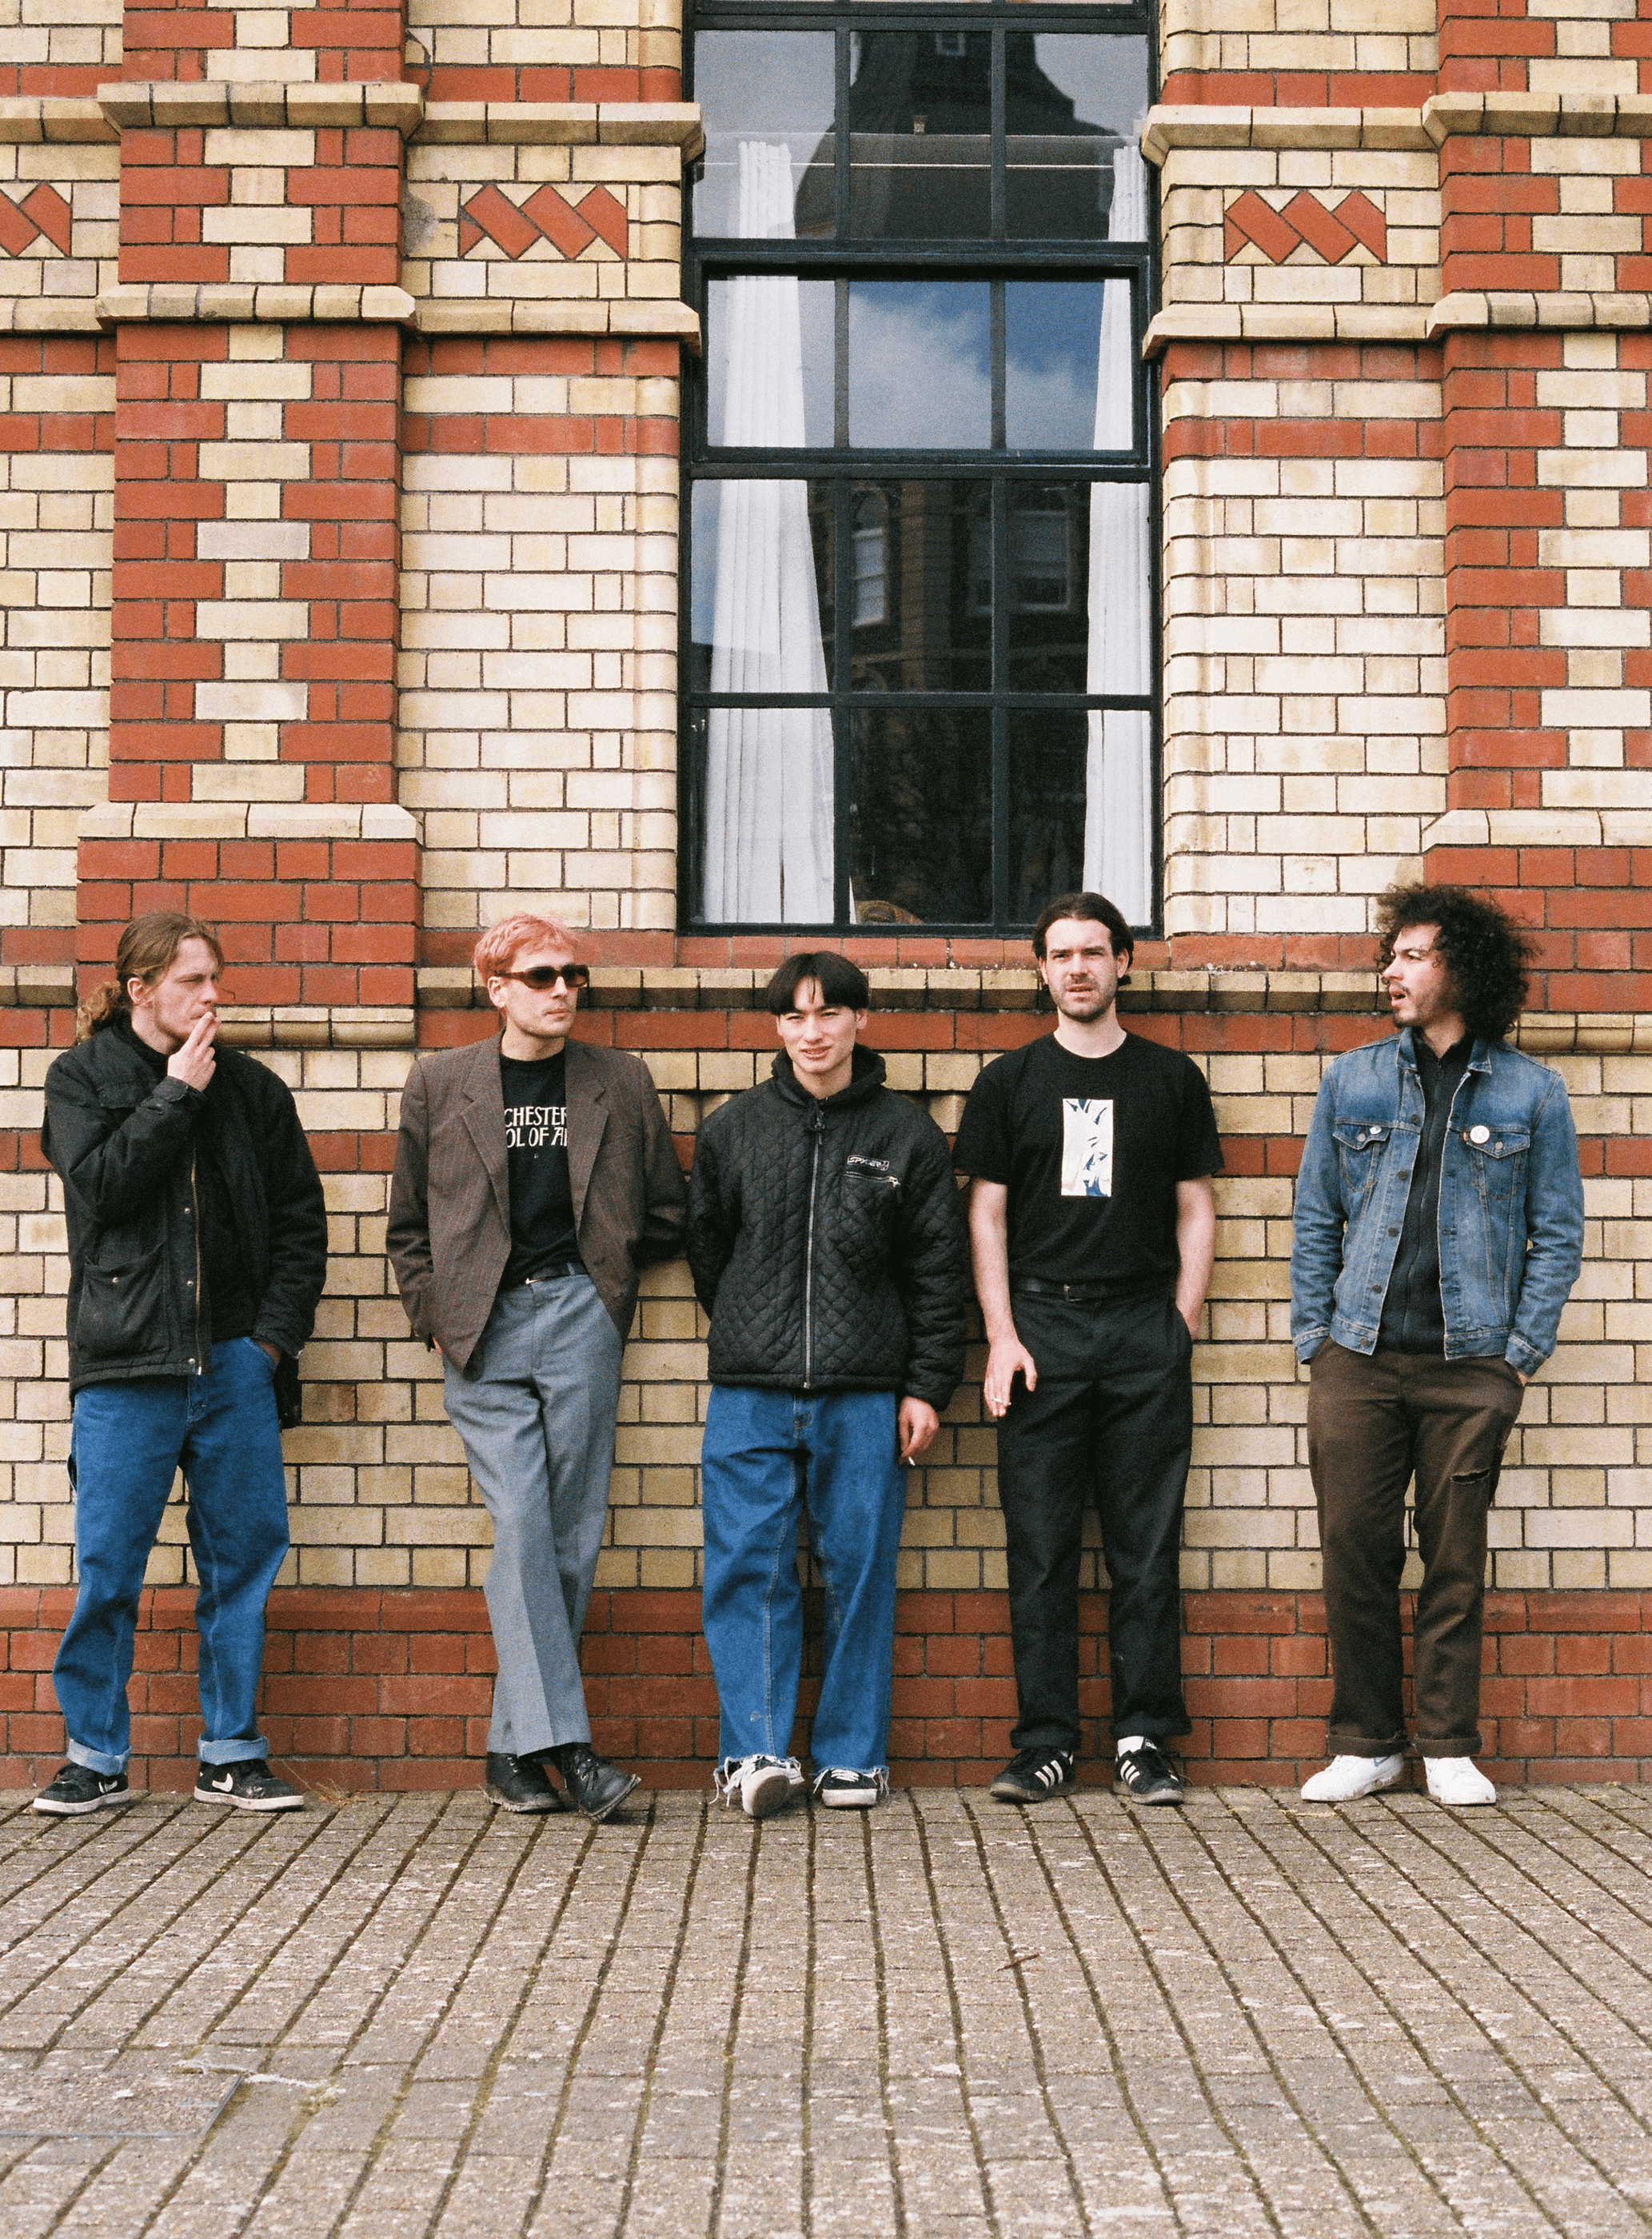 Damefrisor band photo. Photo by Amia Ocean